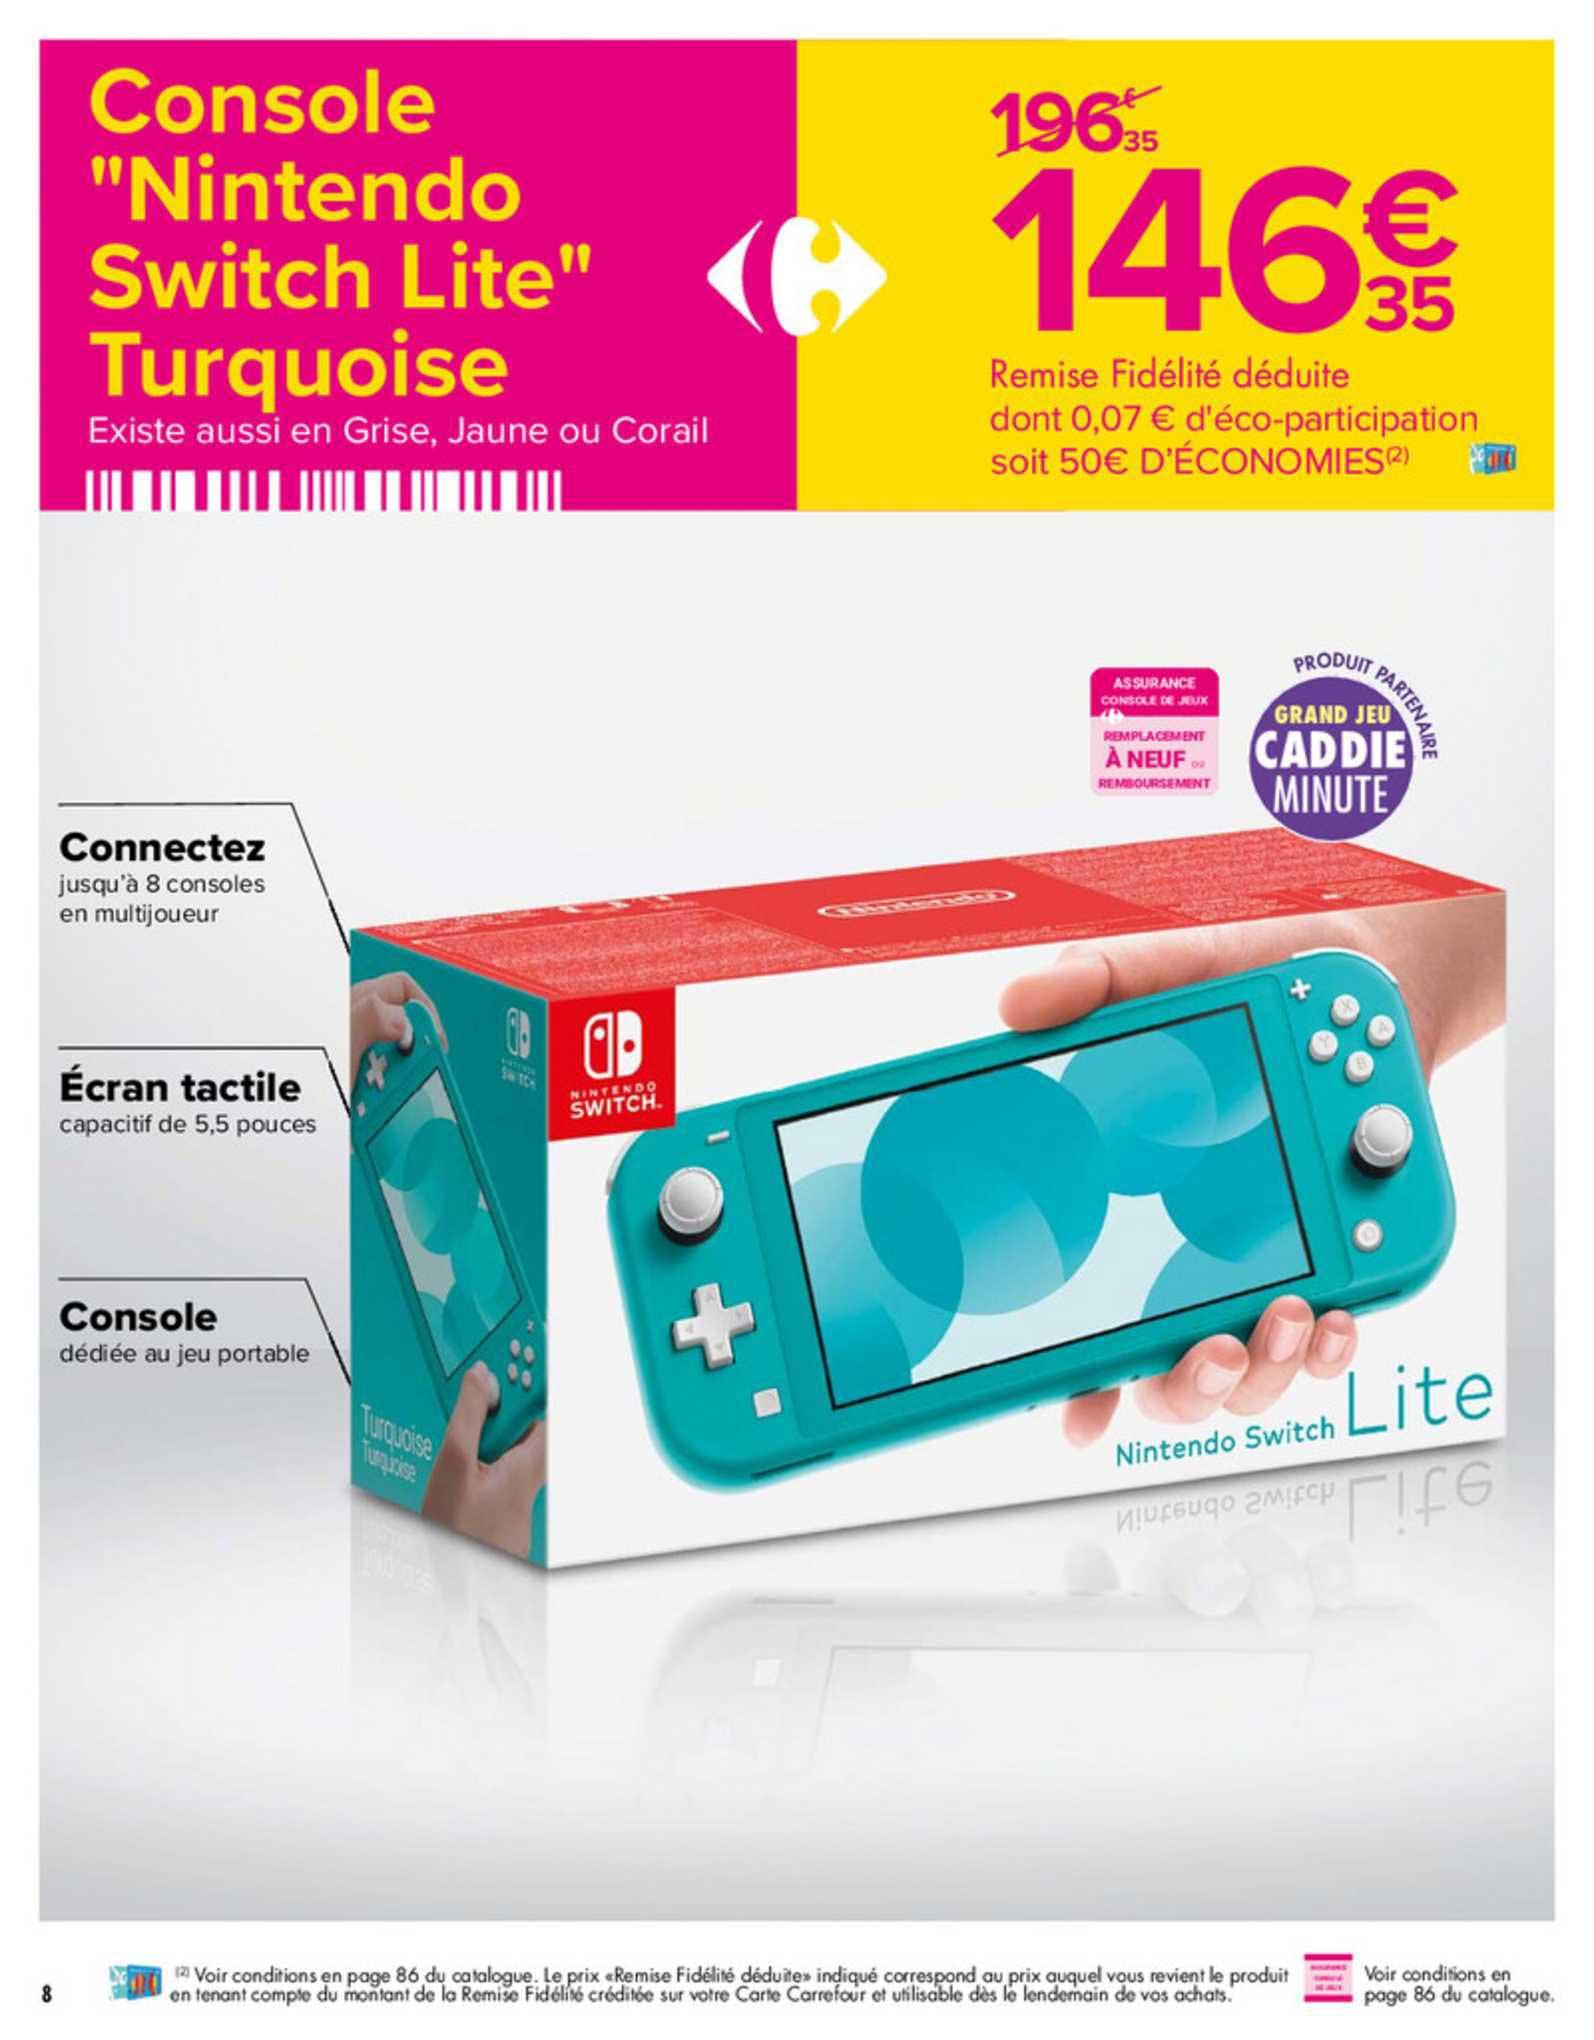 Nintendo Switch Lite Leclerc : nintendo, switch, leclerc, Offre, Console, Nintendo, Switch, Turquoise, Carrefour